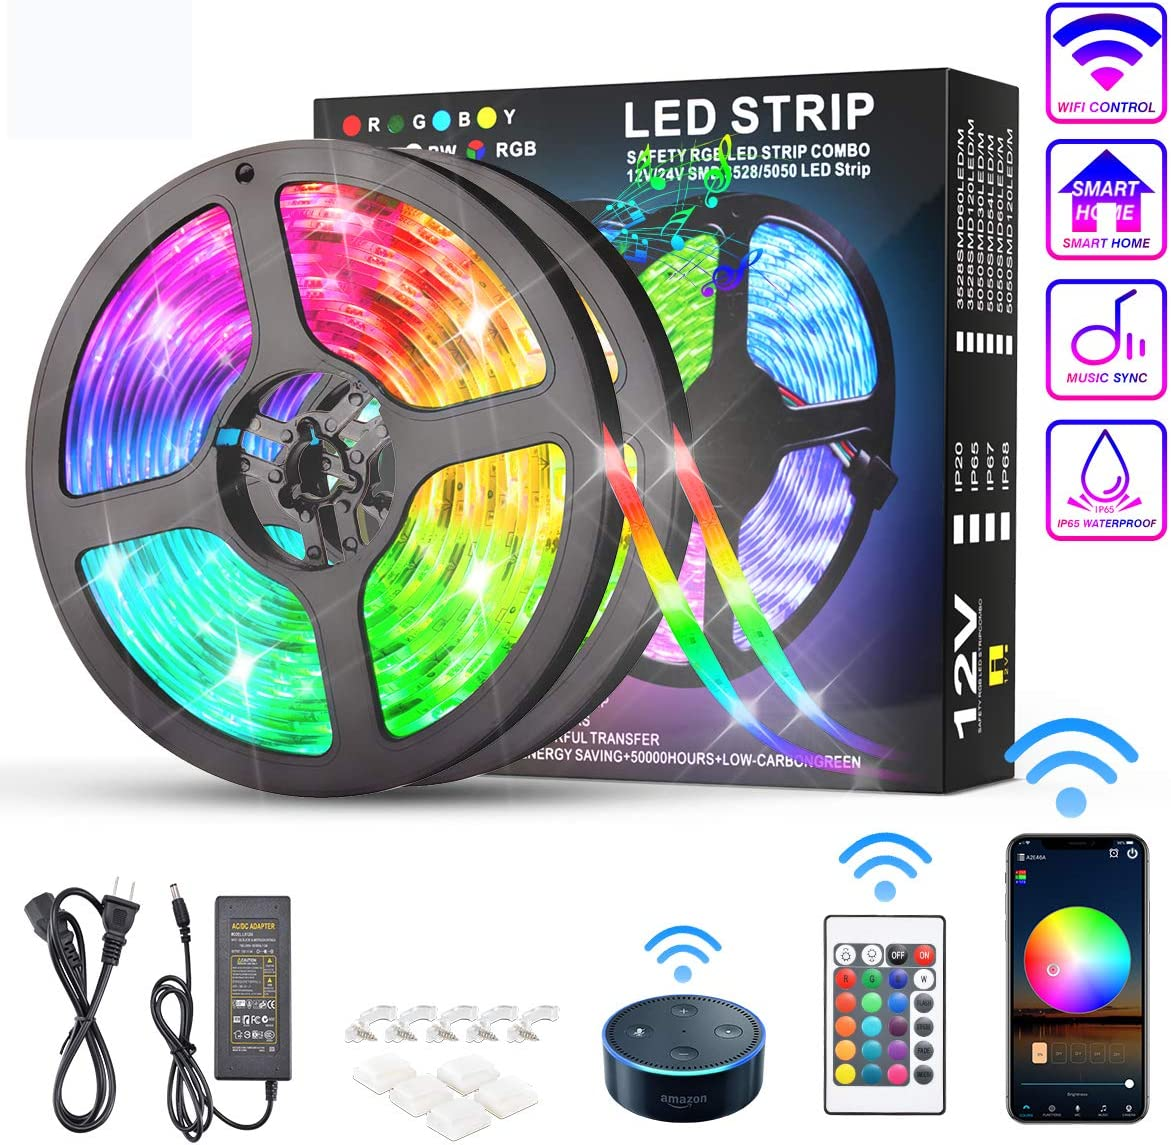 KATUR LED Strip Lights 32.8ft Cash special price with Works Japan Maker New Google Assistant Alexa